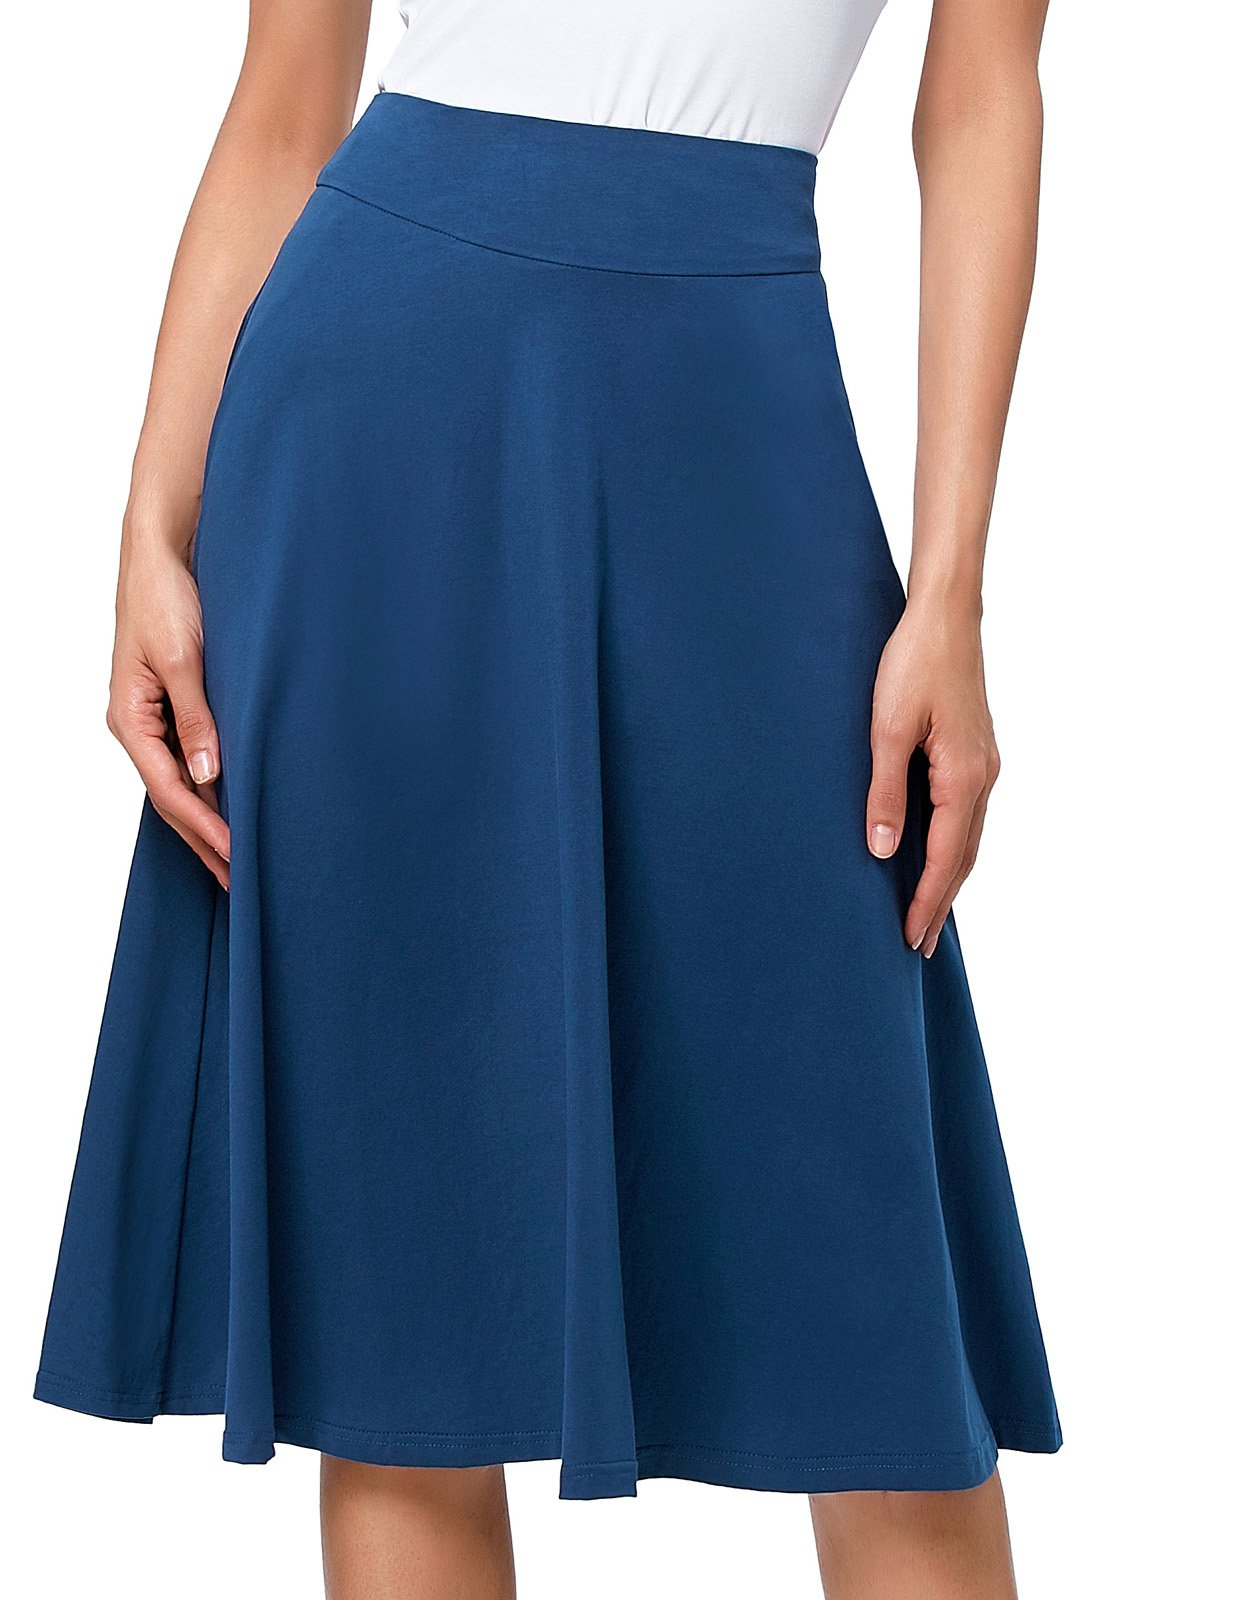 Elegant Swing A Line Skirts Women Knee Length (L, Yale Blue)